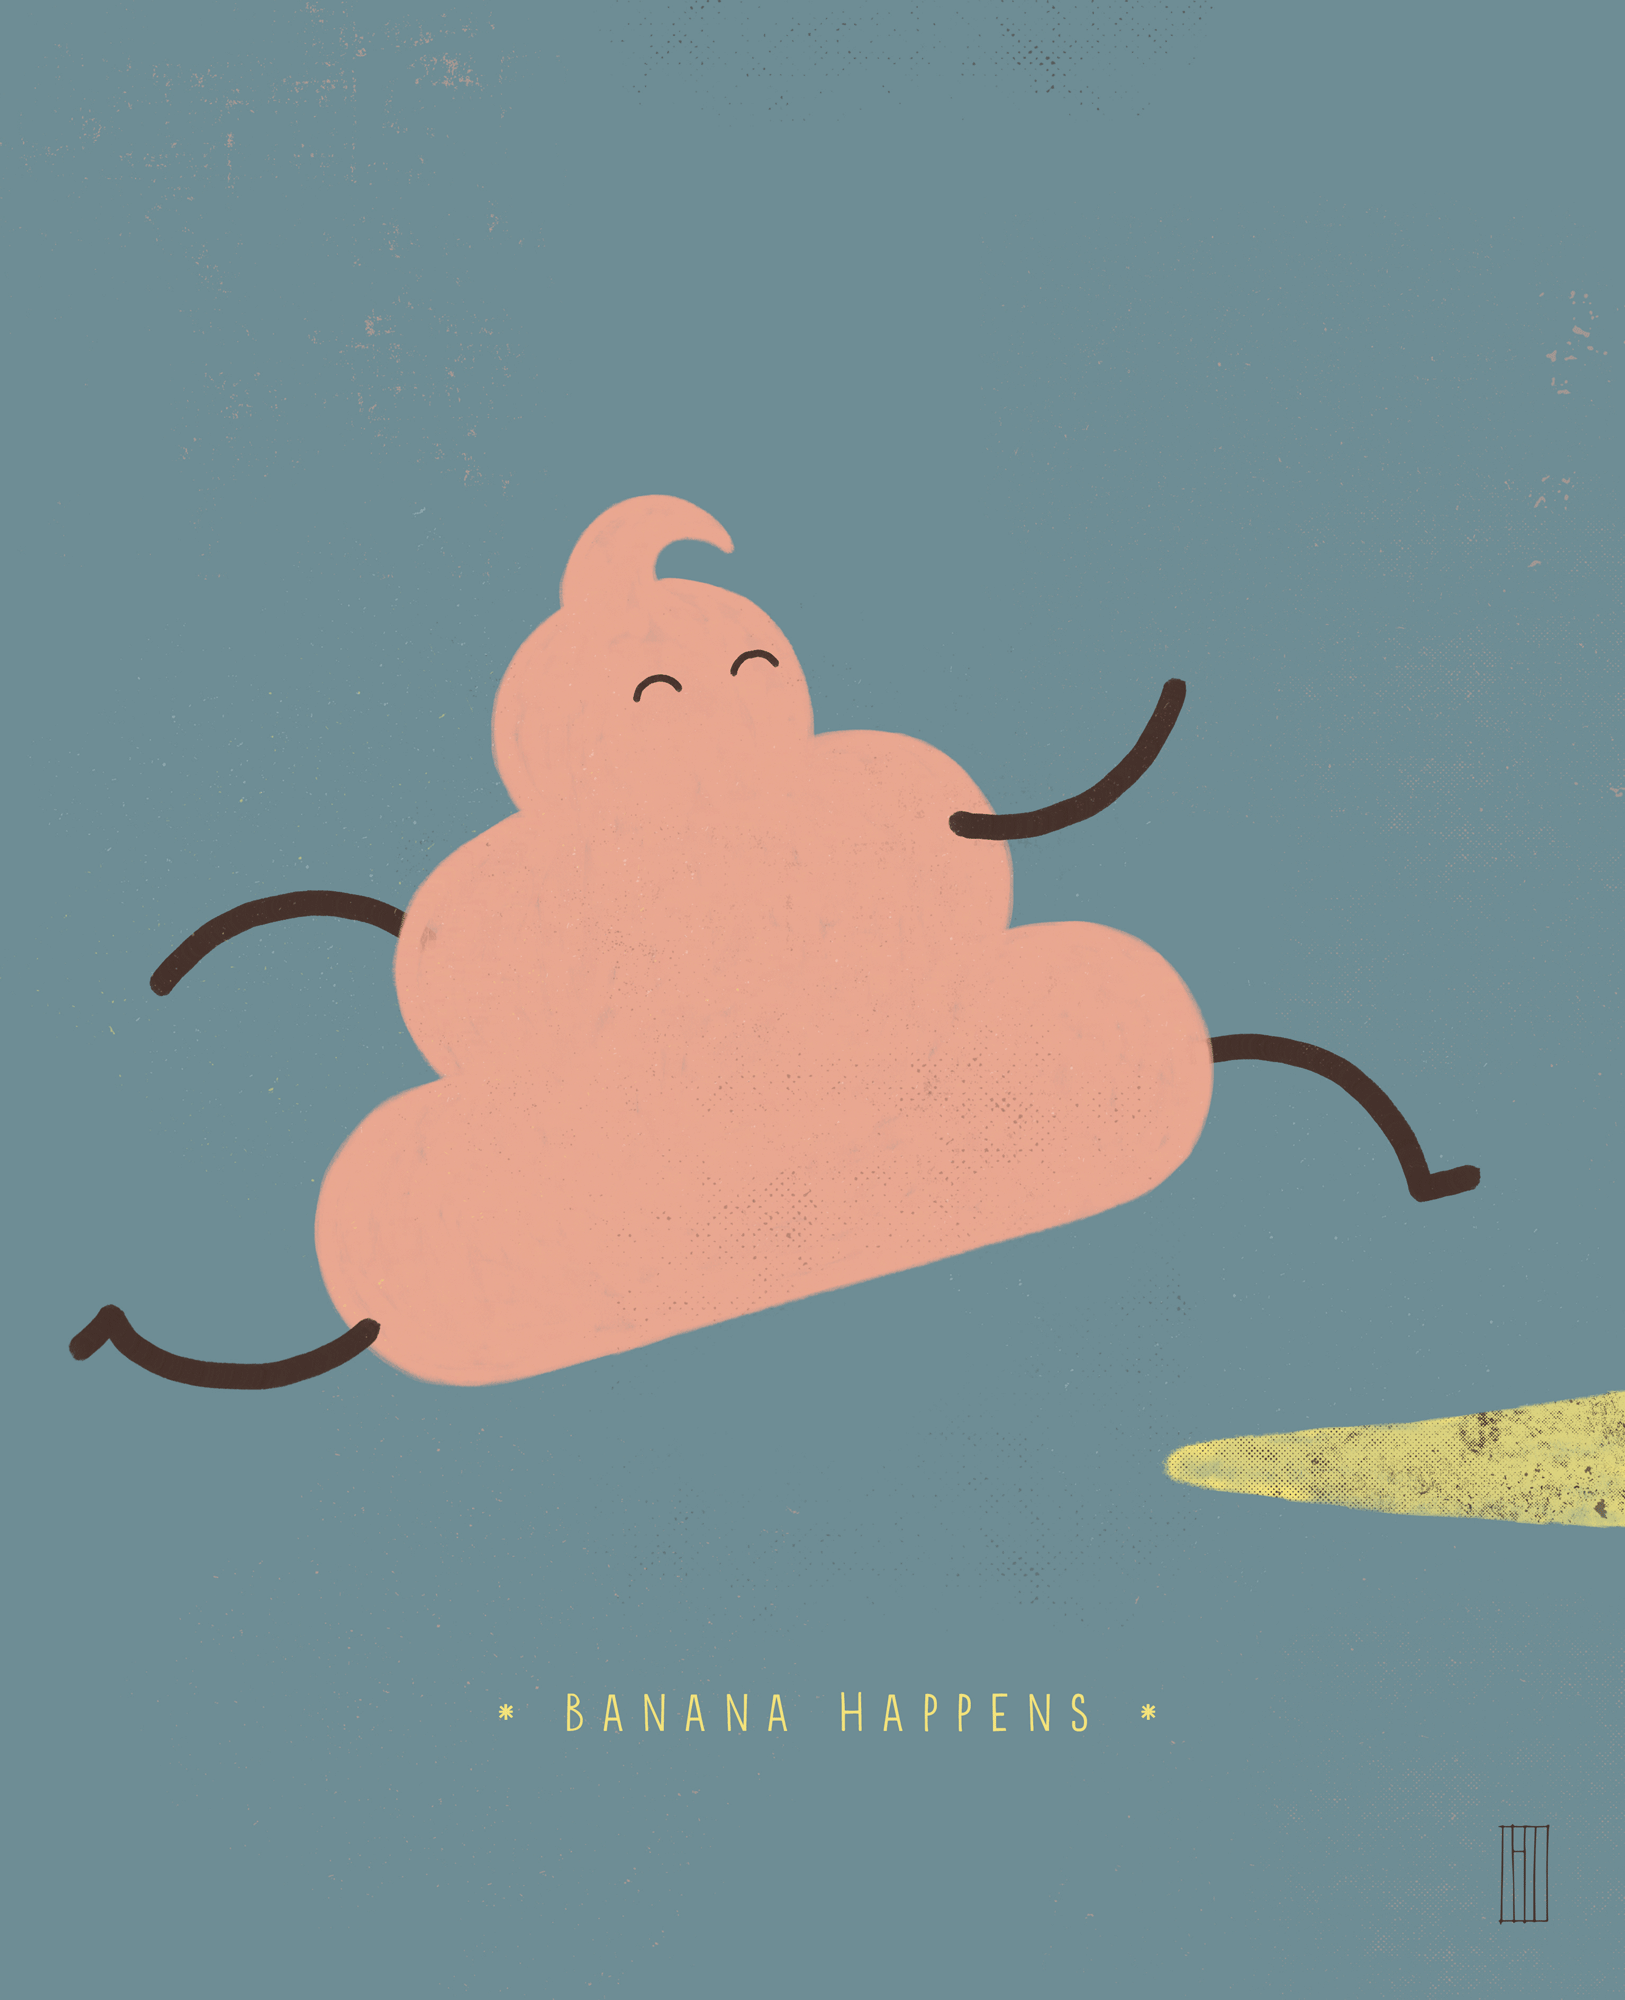 Banana-happens-(2000).png